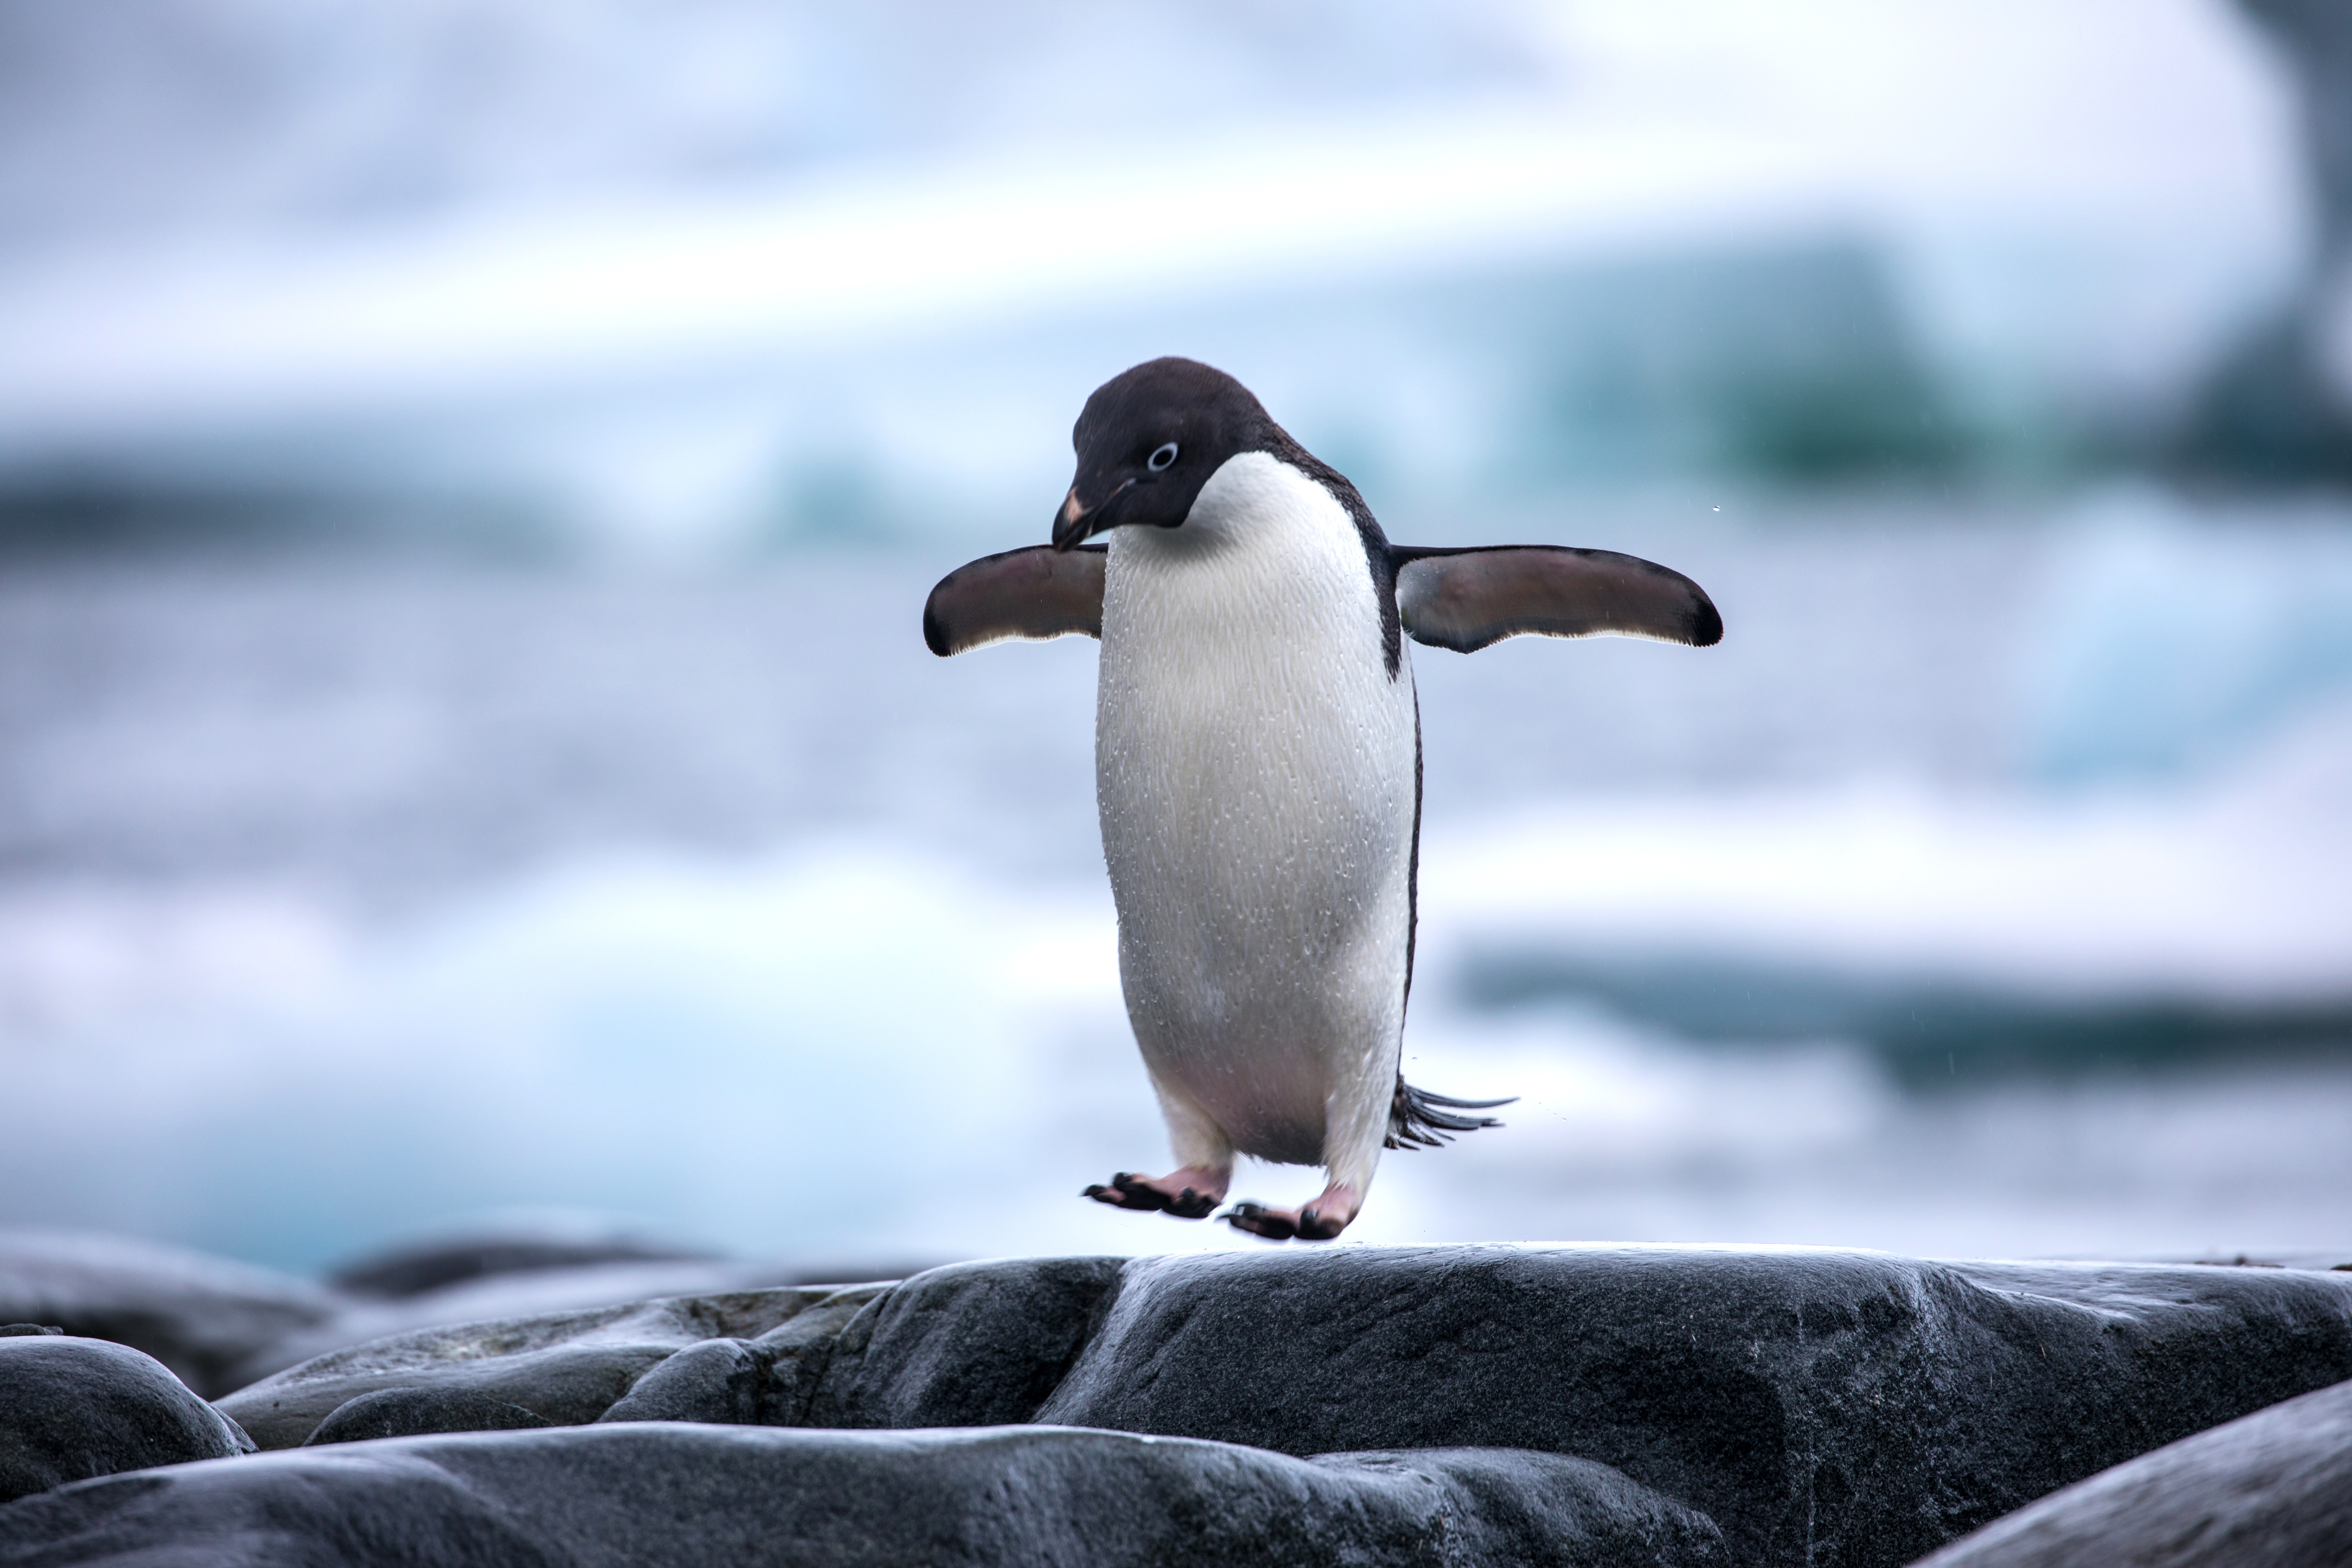 Penguin Random House Hires Penguin as Intern